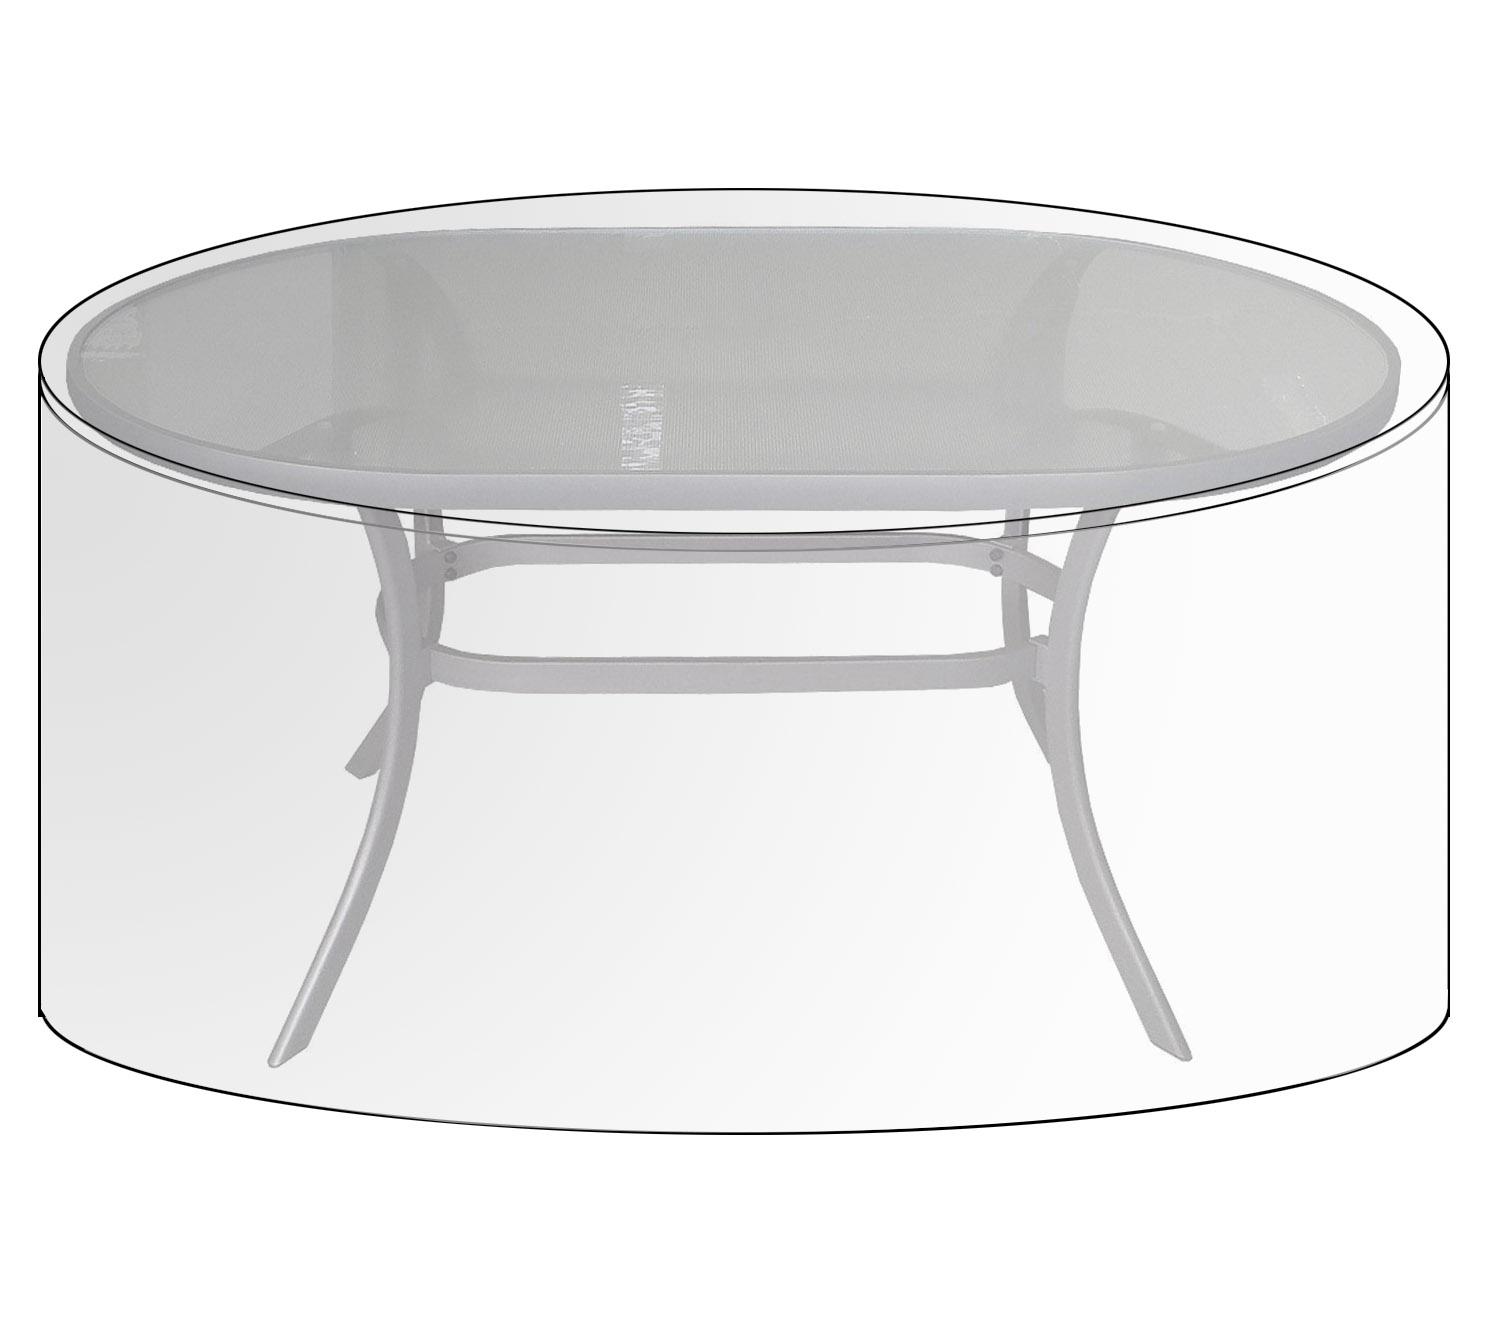 gartenm bel schutzh lle plane sitzgruppe ampelschirm sonneninsel garnitur 126 ebay. Black Bedroom Furniture Sets. Home Design Ideas